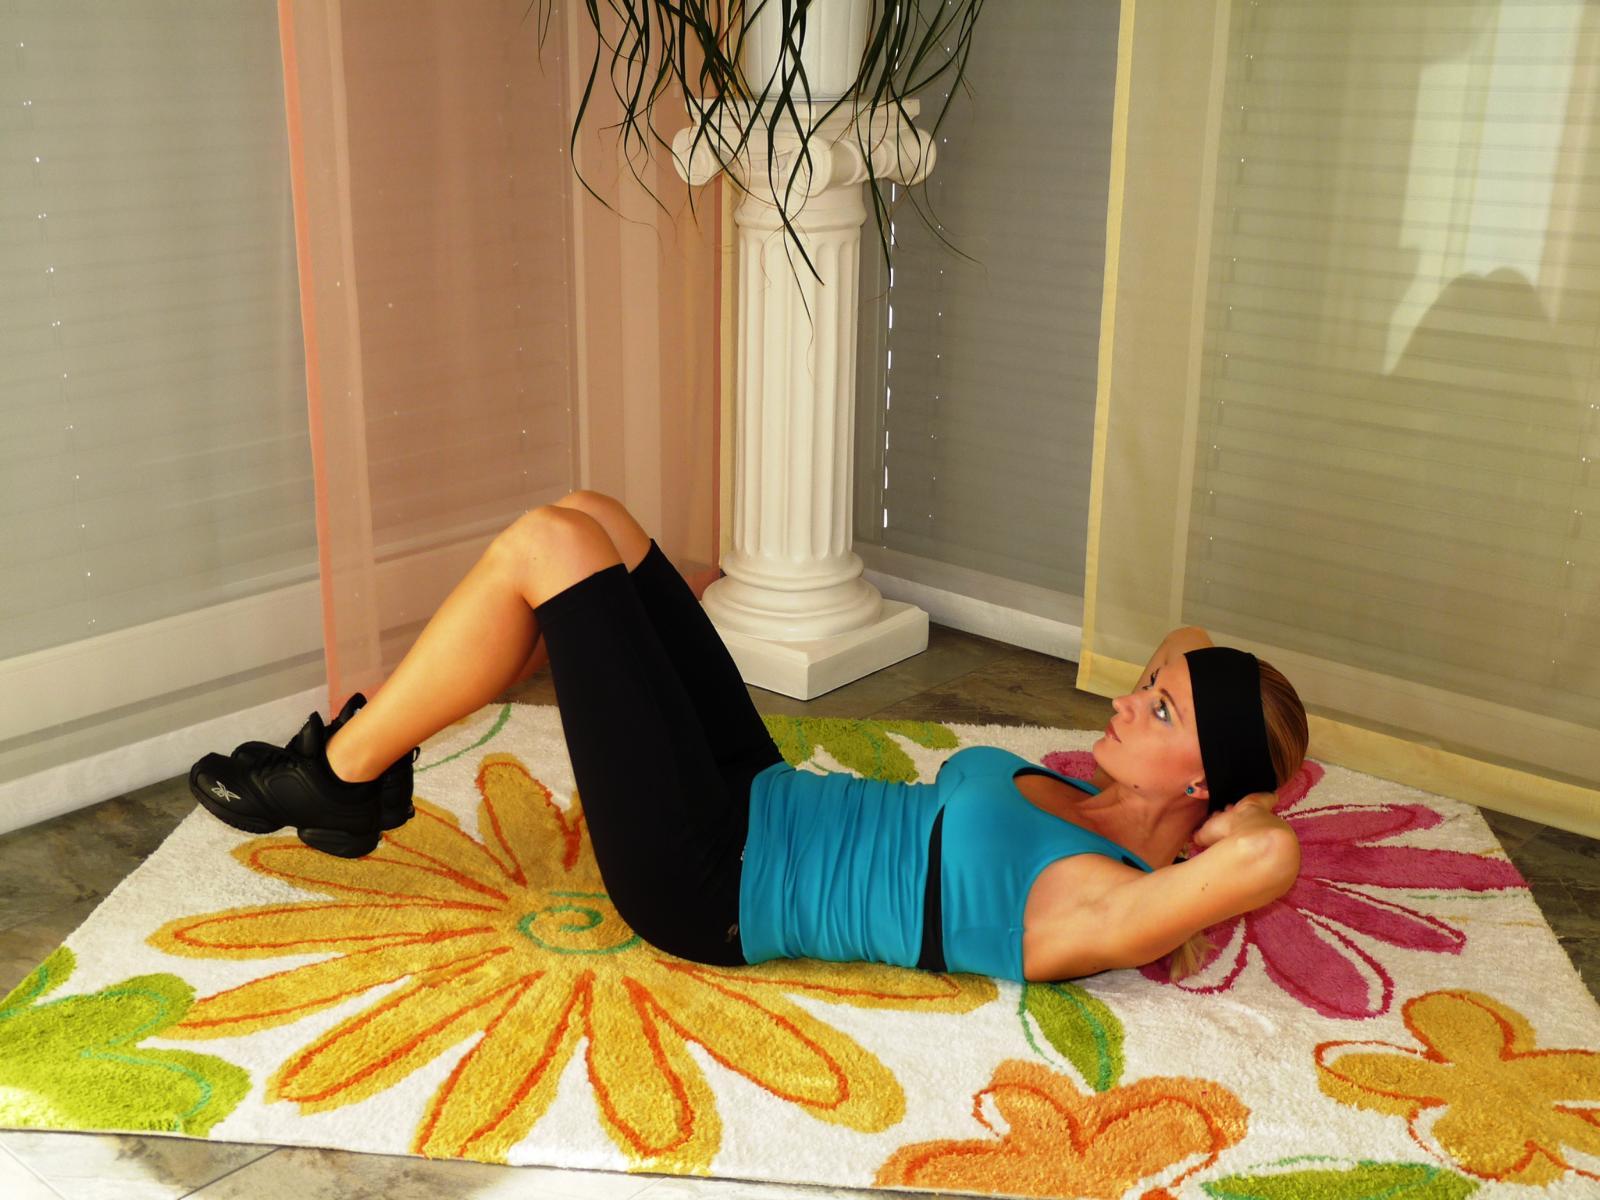 bauchtraining flacher bauch und sixpack. Black Bedroom Furniture Sets. Home Design Ideas